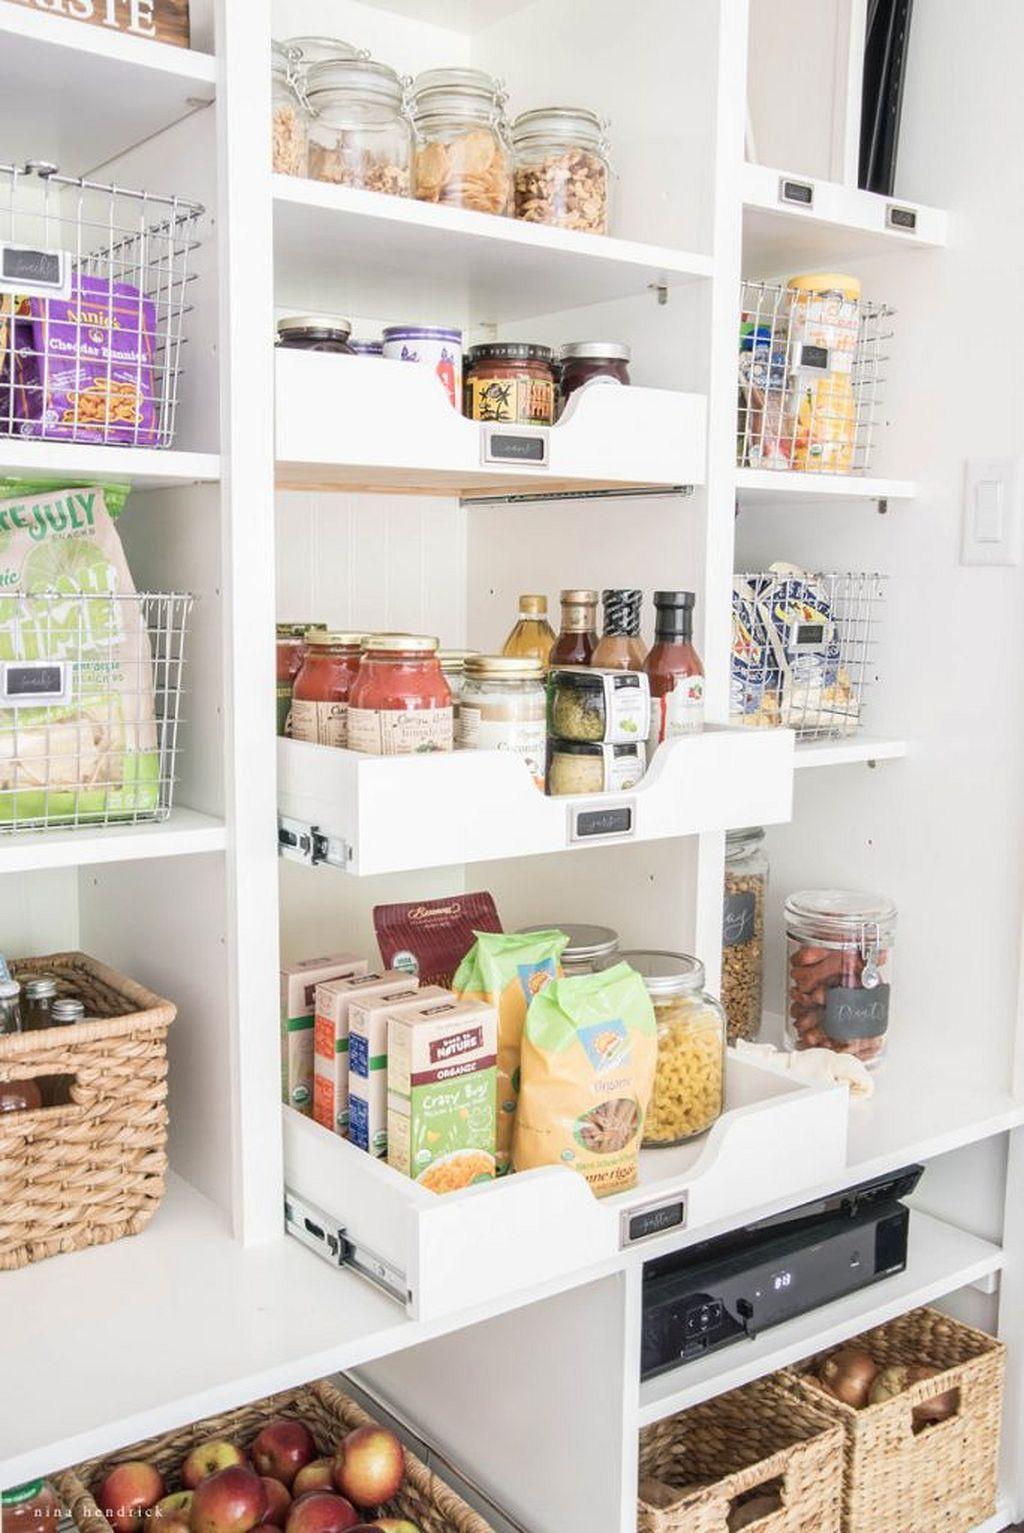 60 Pantry Organization Ideas 13 | Despensa